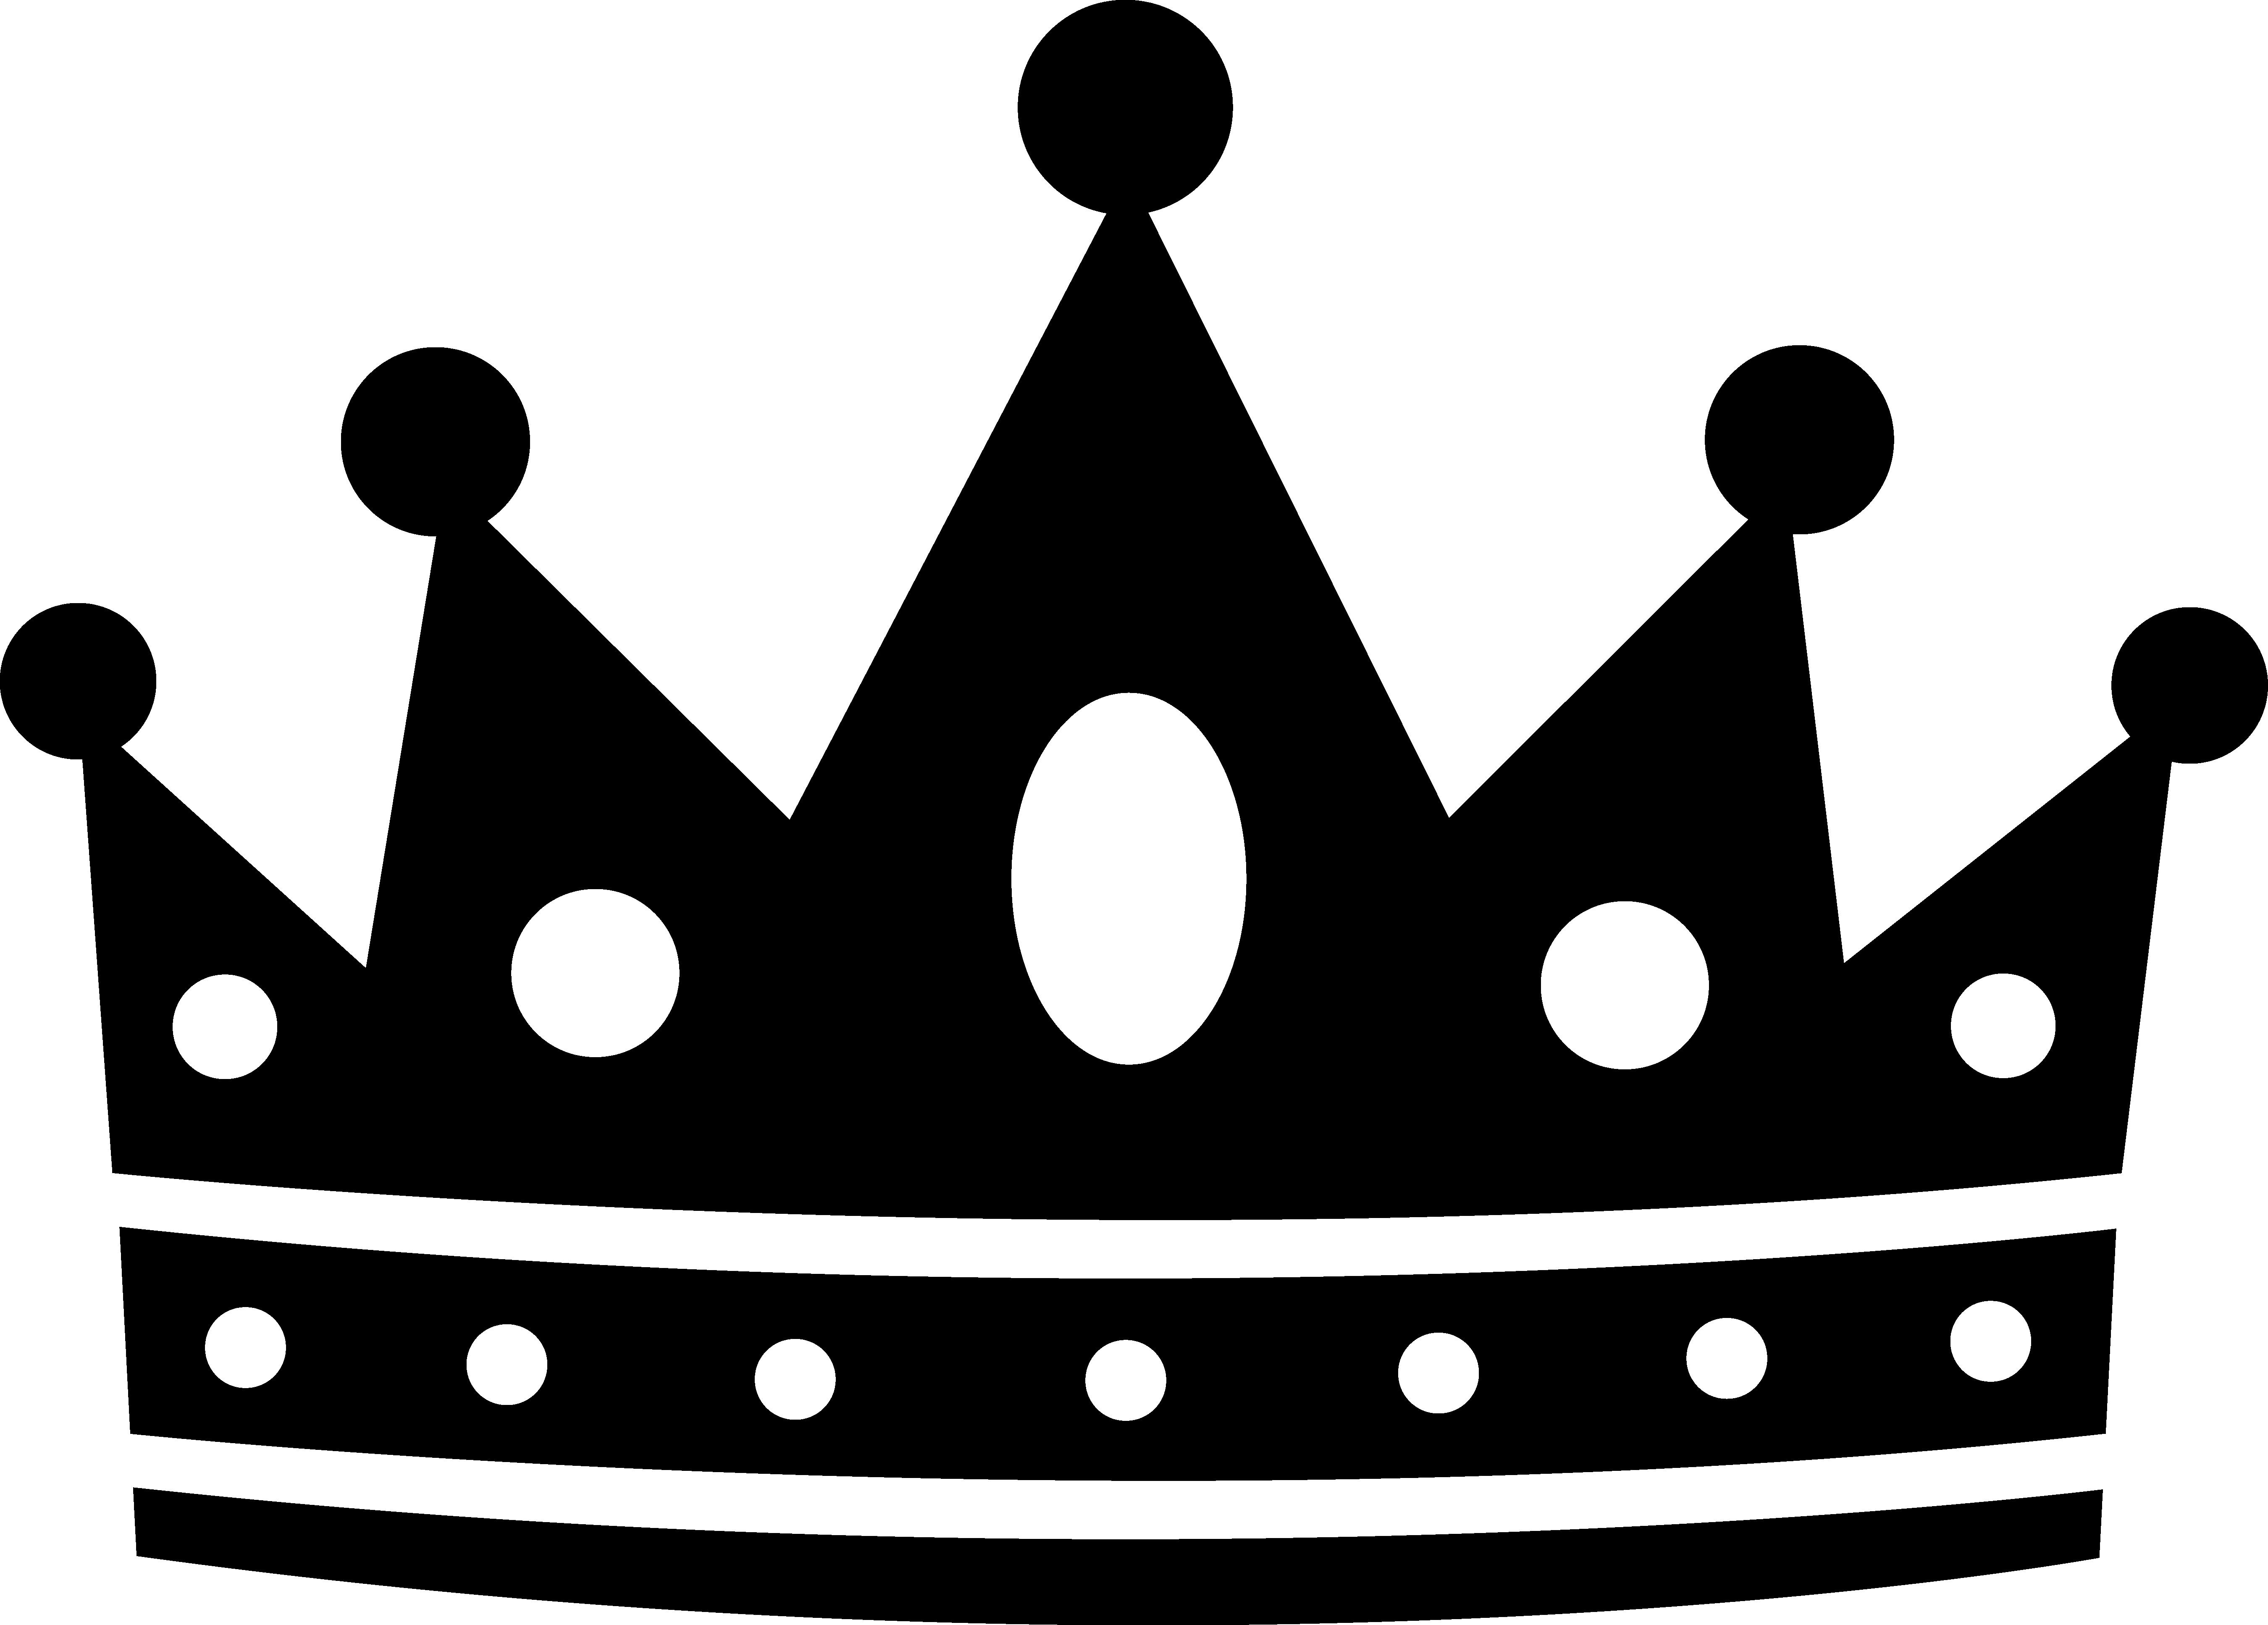 Black Crown Clipart | Clipart Panda - Free Clipart Images